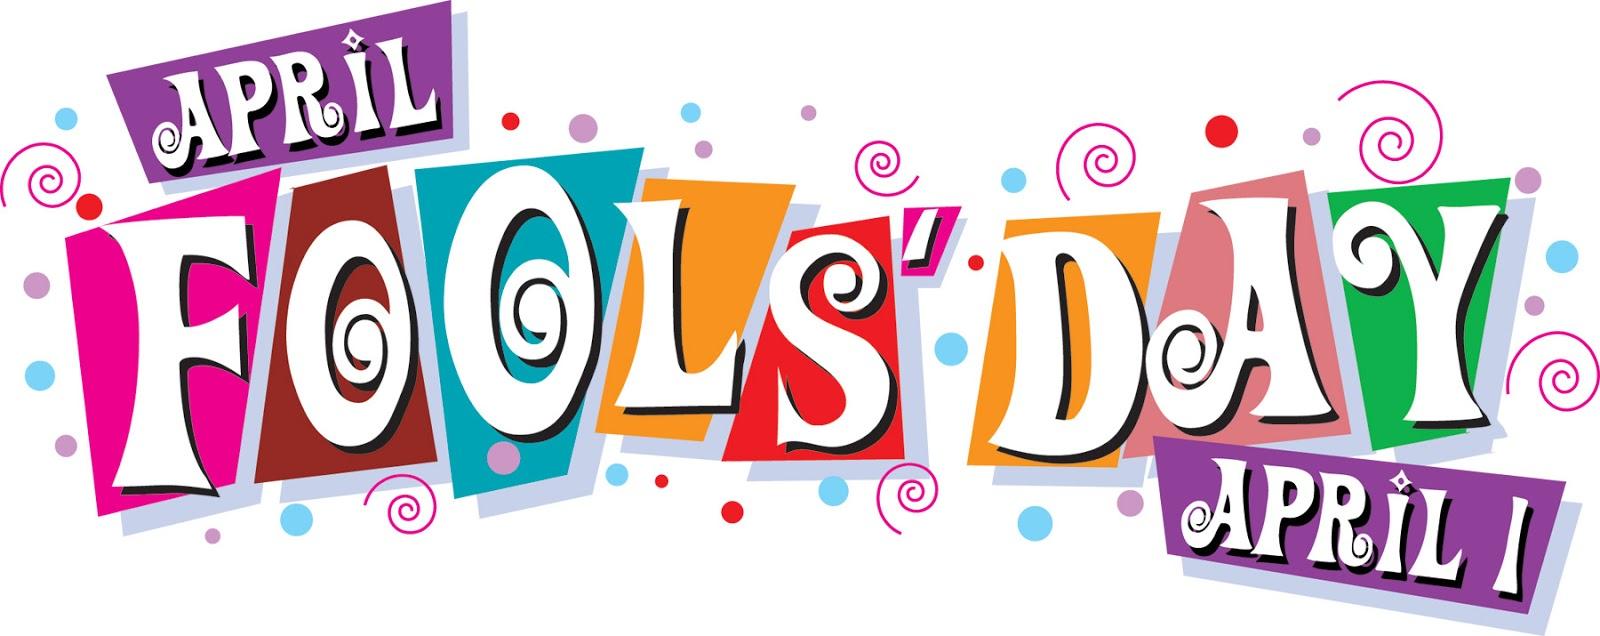 April Fools Pranks For School | Best April Fools 2019 Pranks